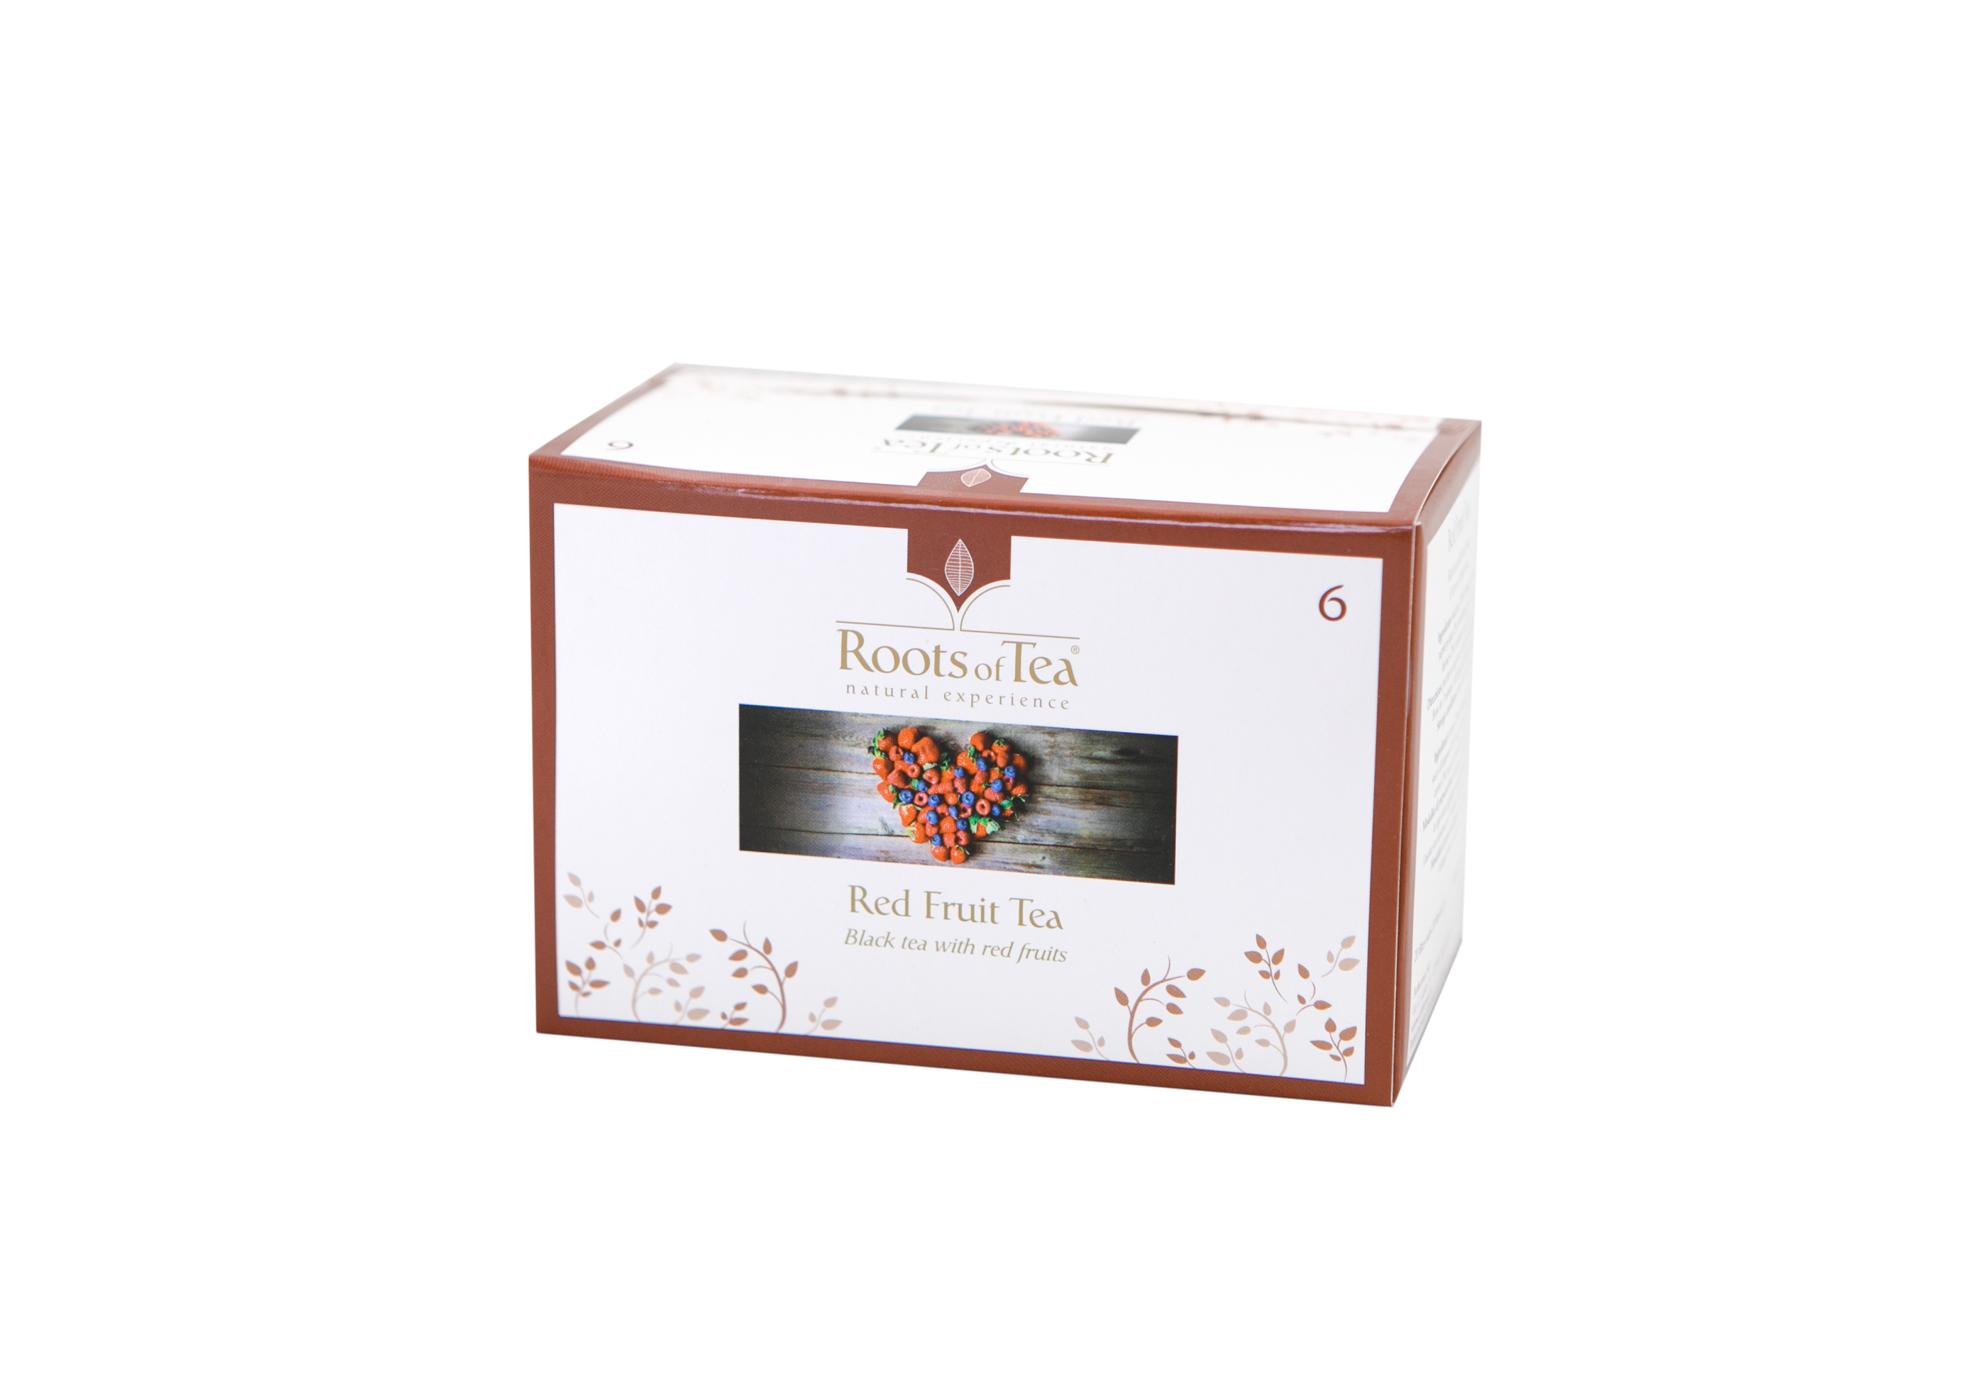 Red Fruit Tea